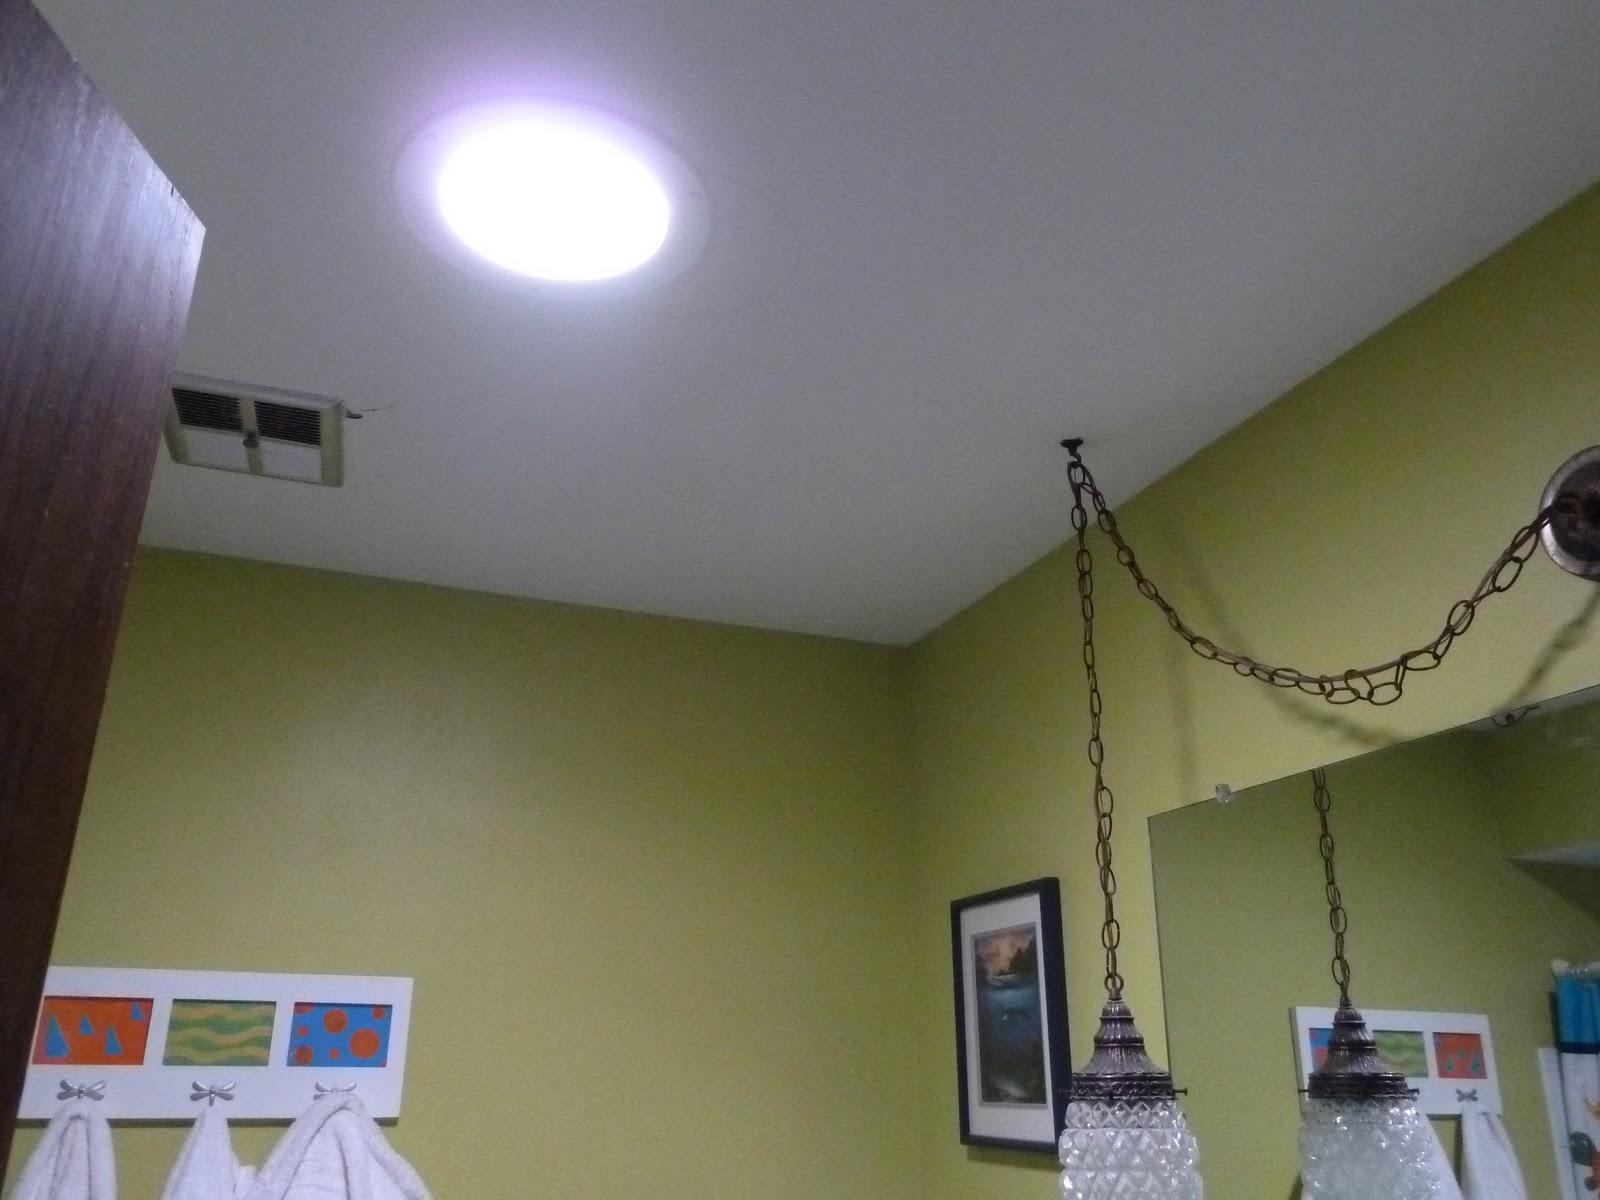 how to bring light into a bathroom with no windows